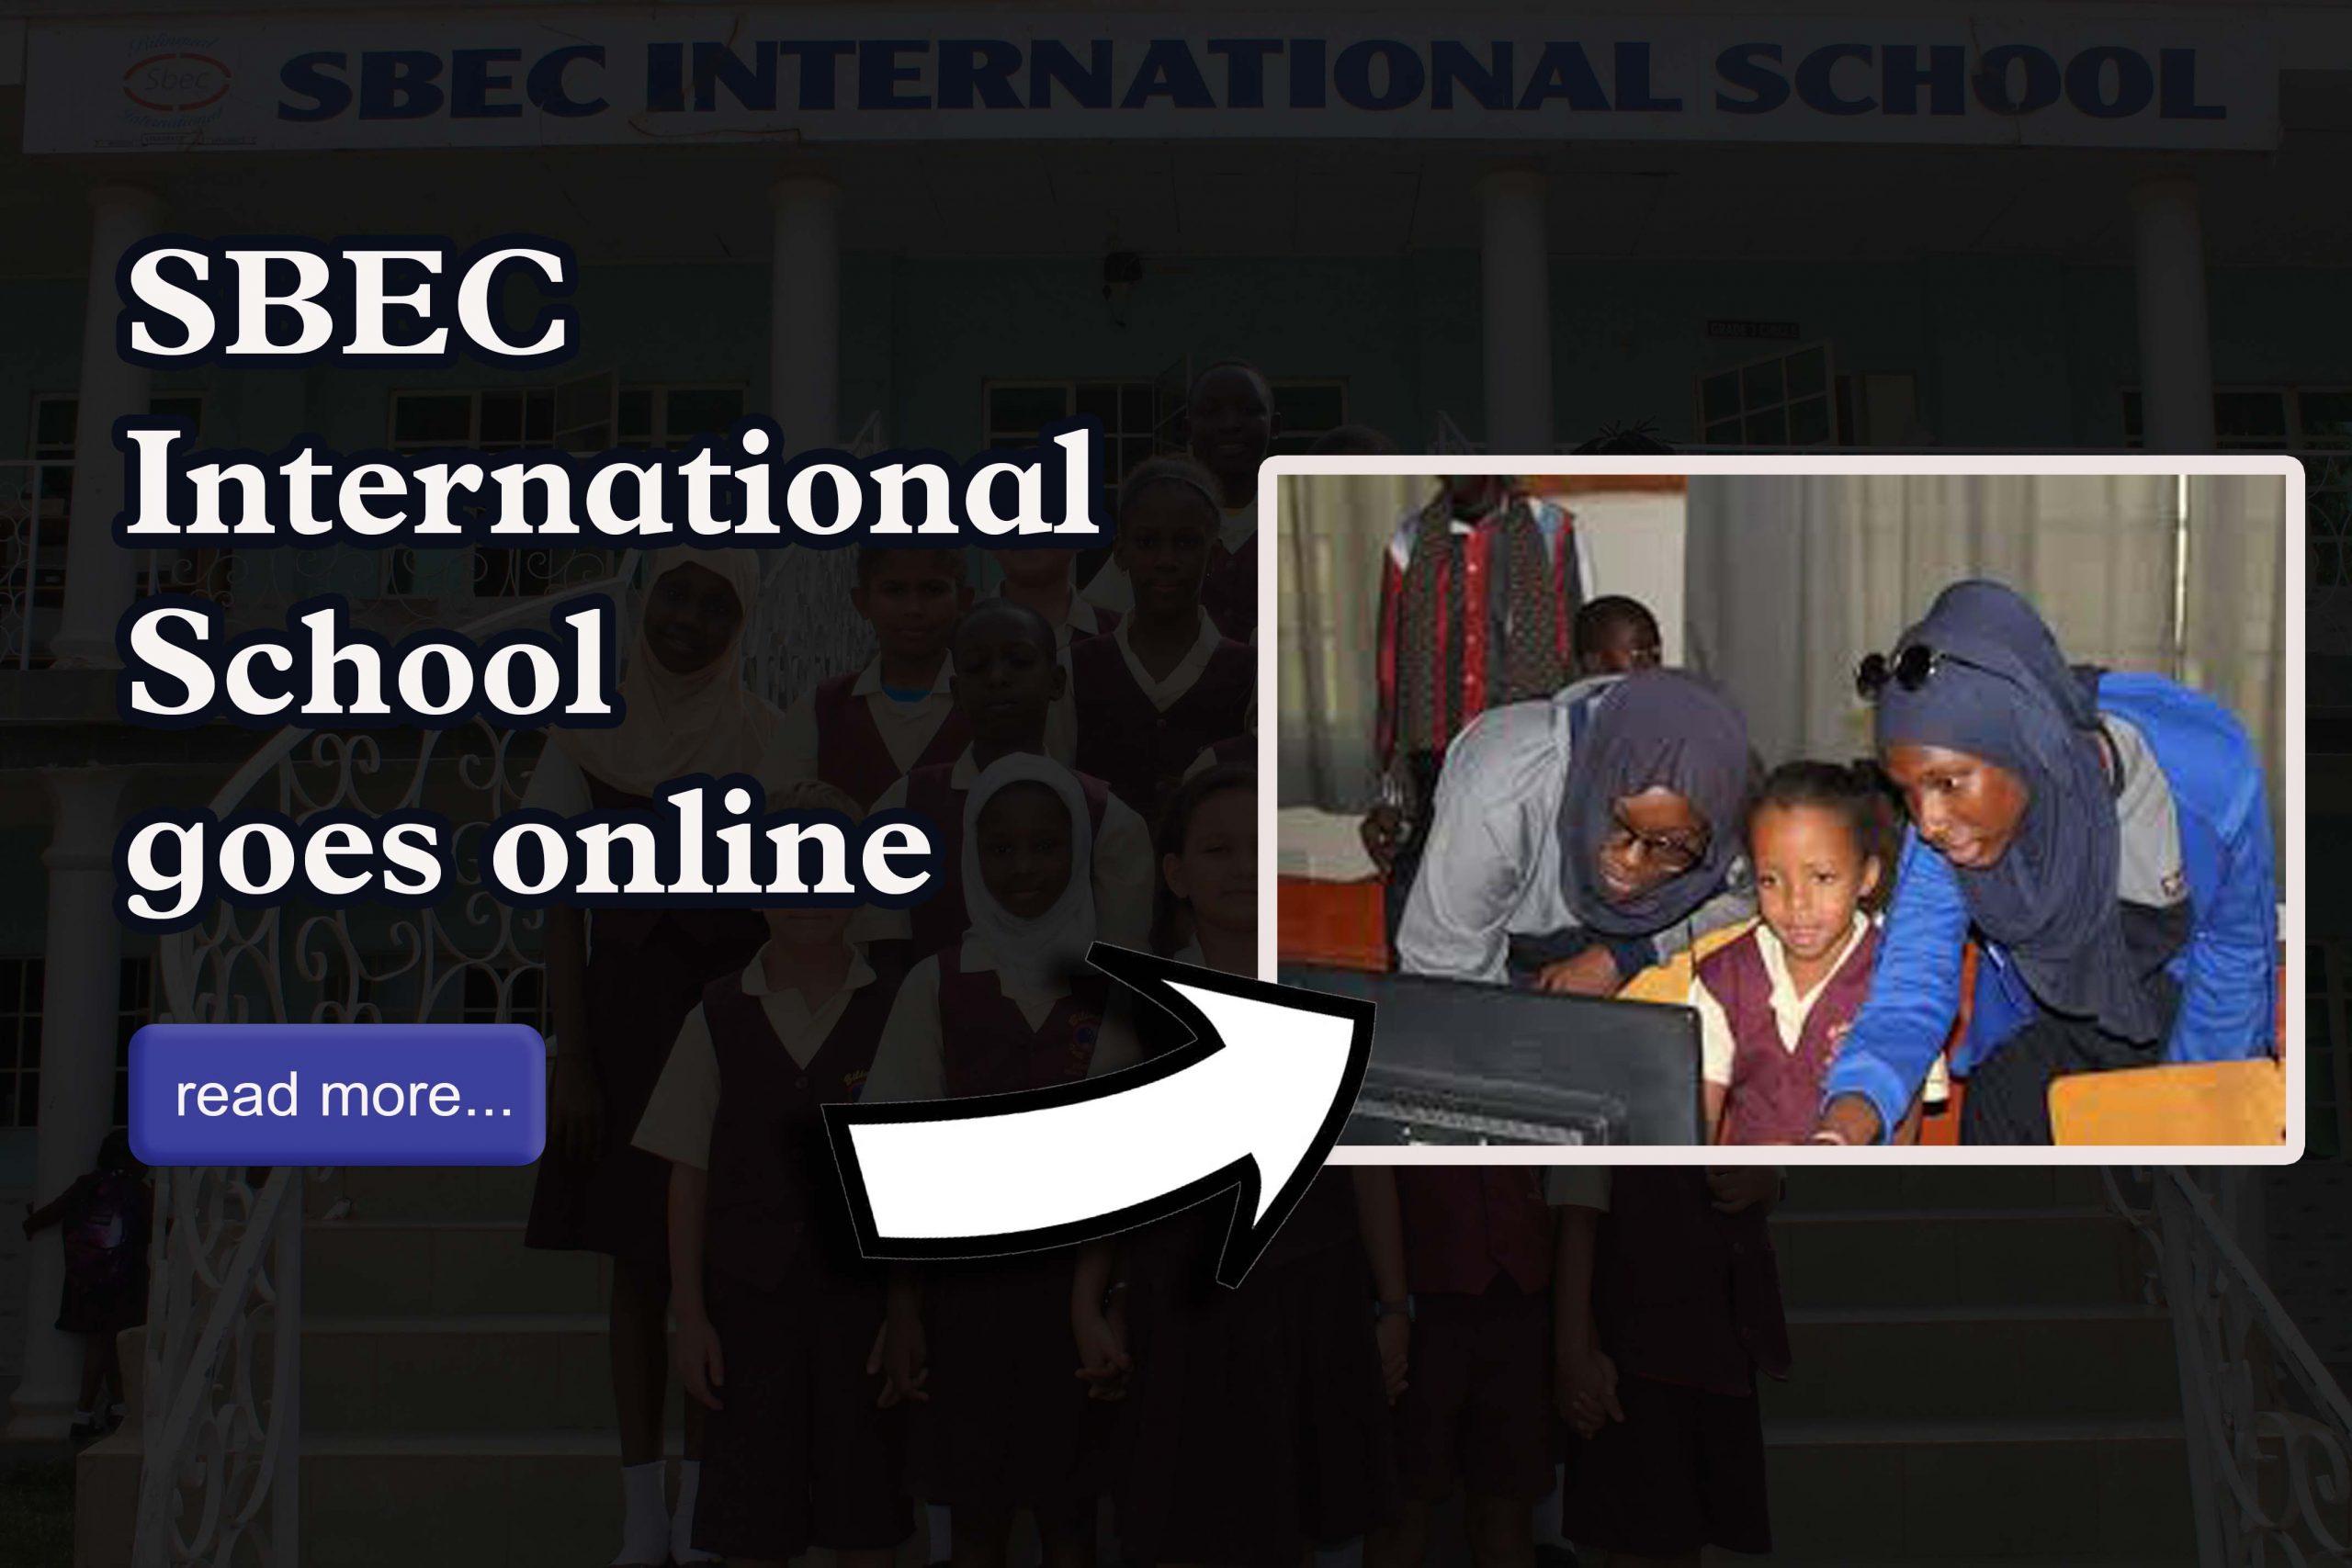 SBEC goes online